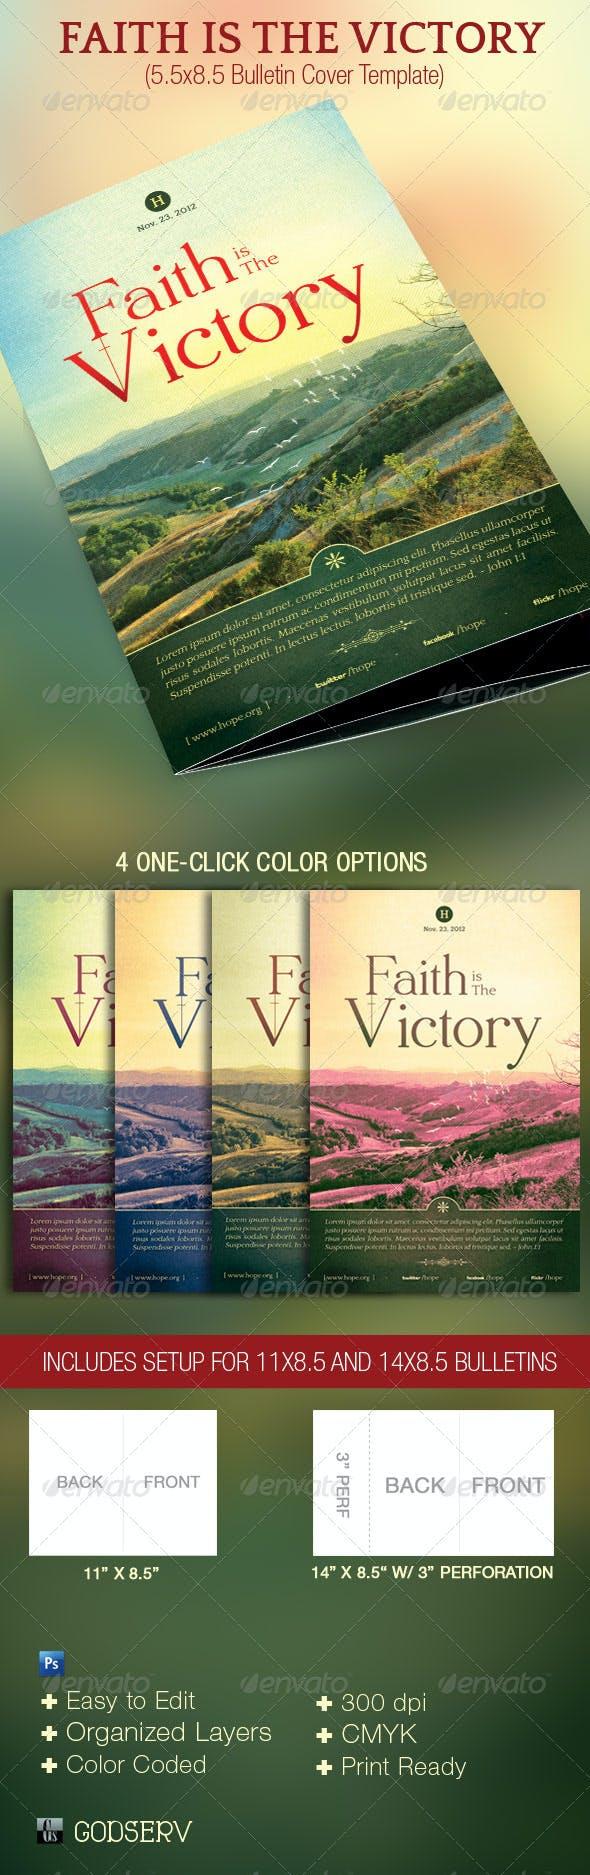 faith victory church bulletin template by godserv graphicriver